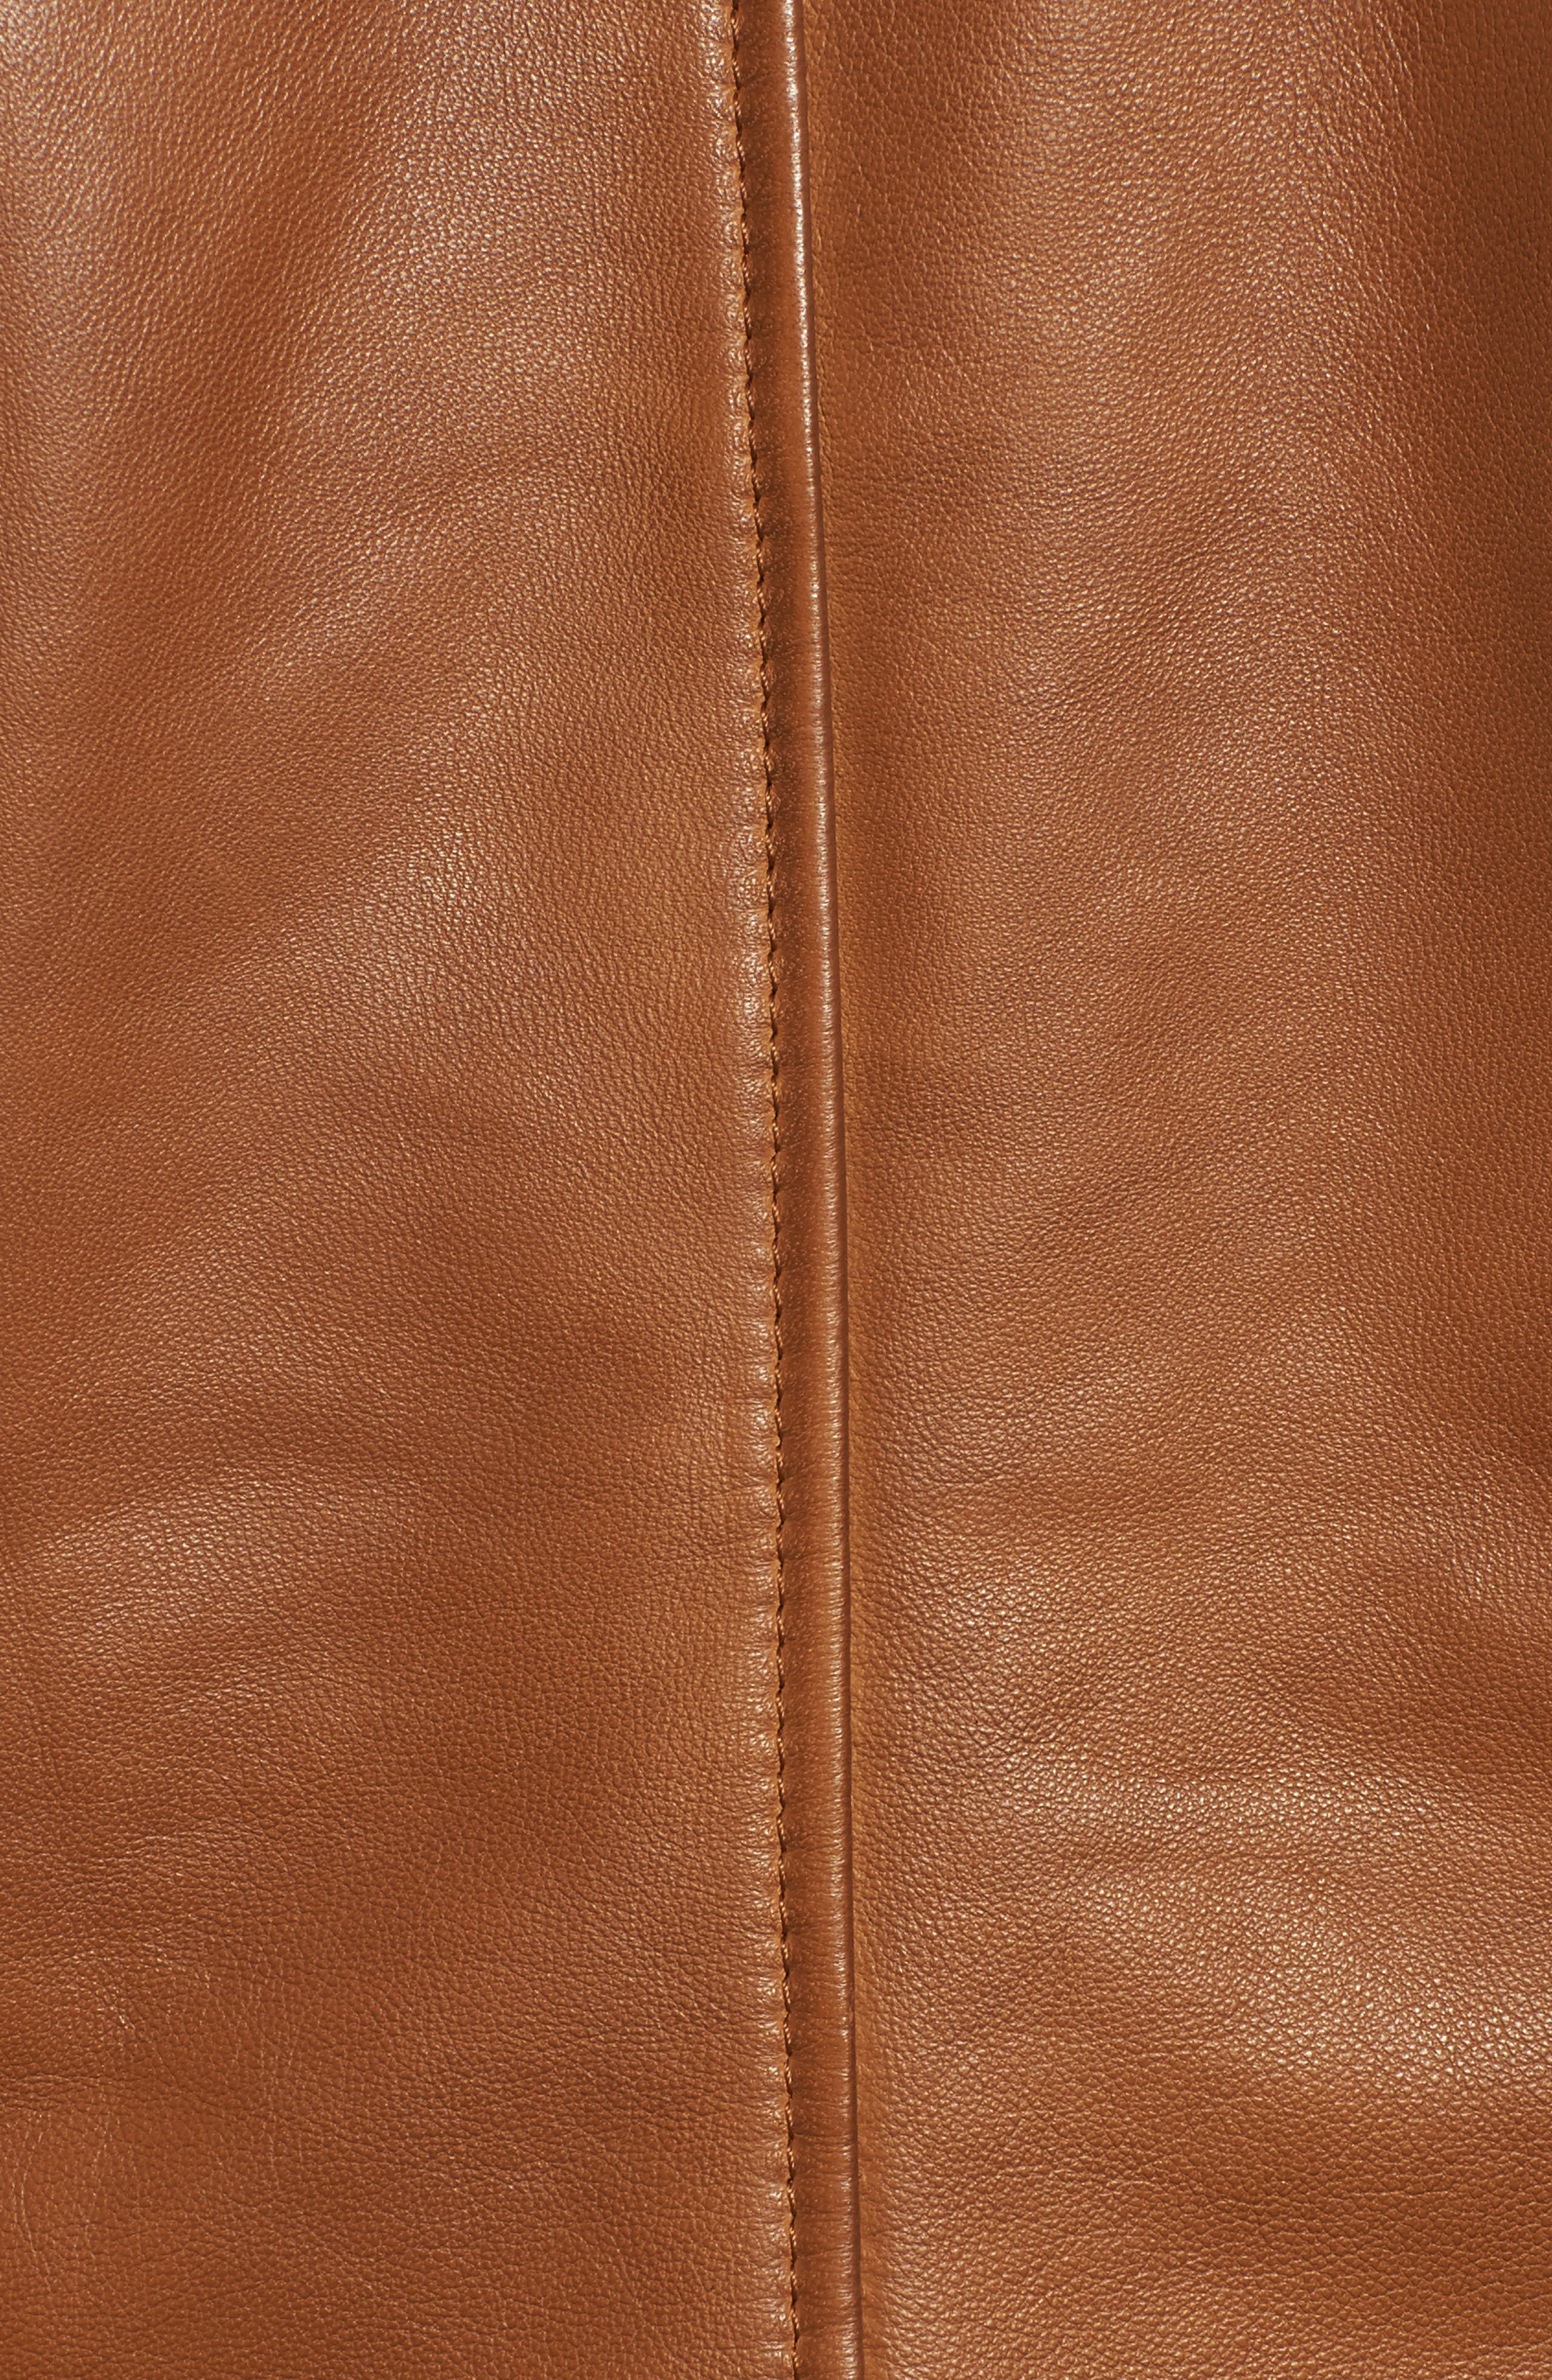 Leather Moto Jacket,                             Alternate thumbnail 24, color,